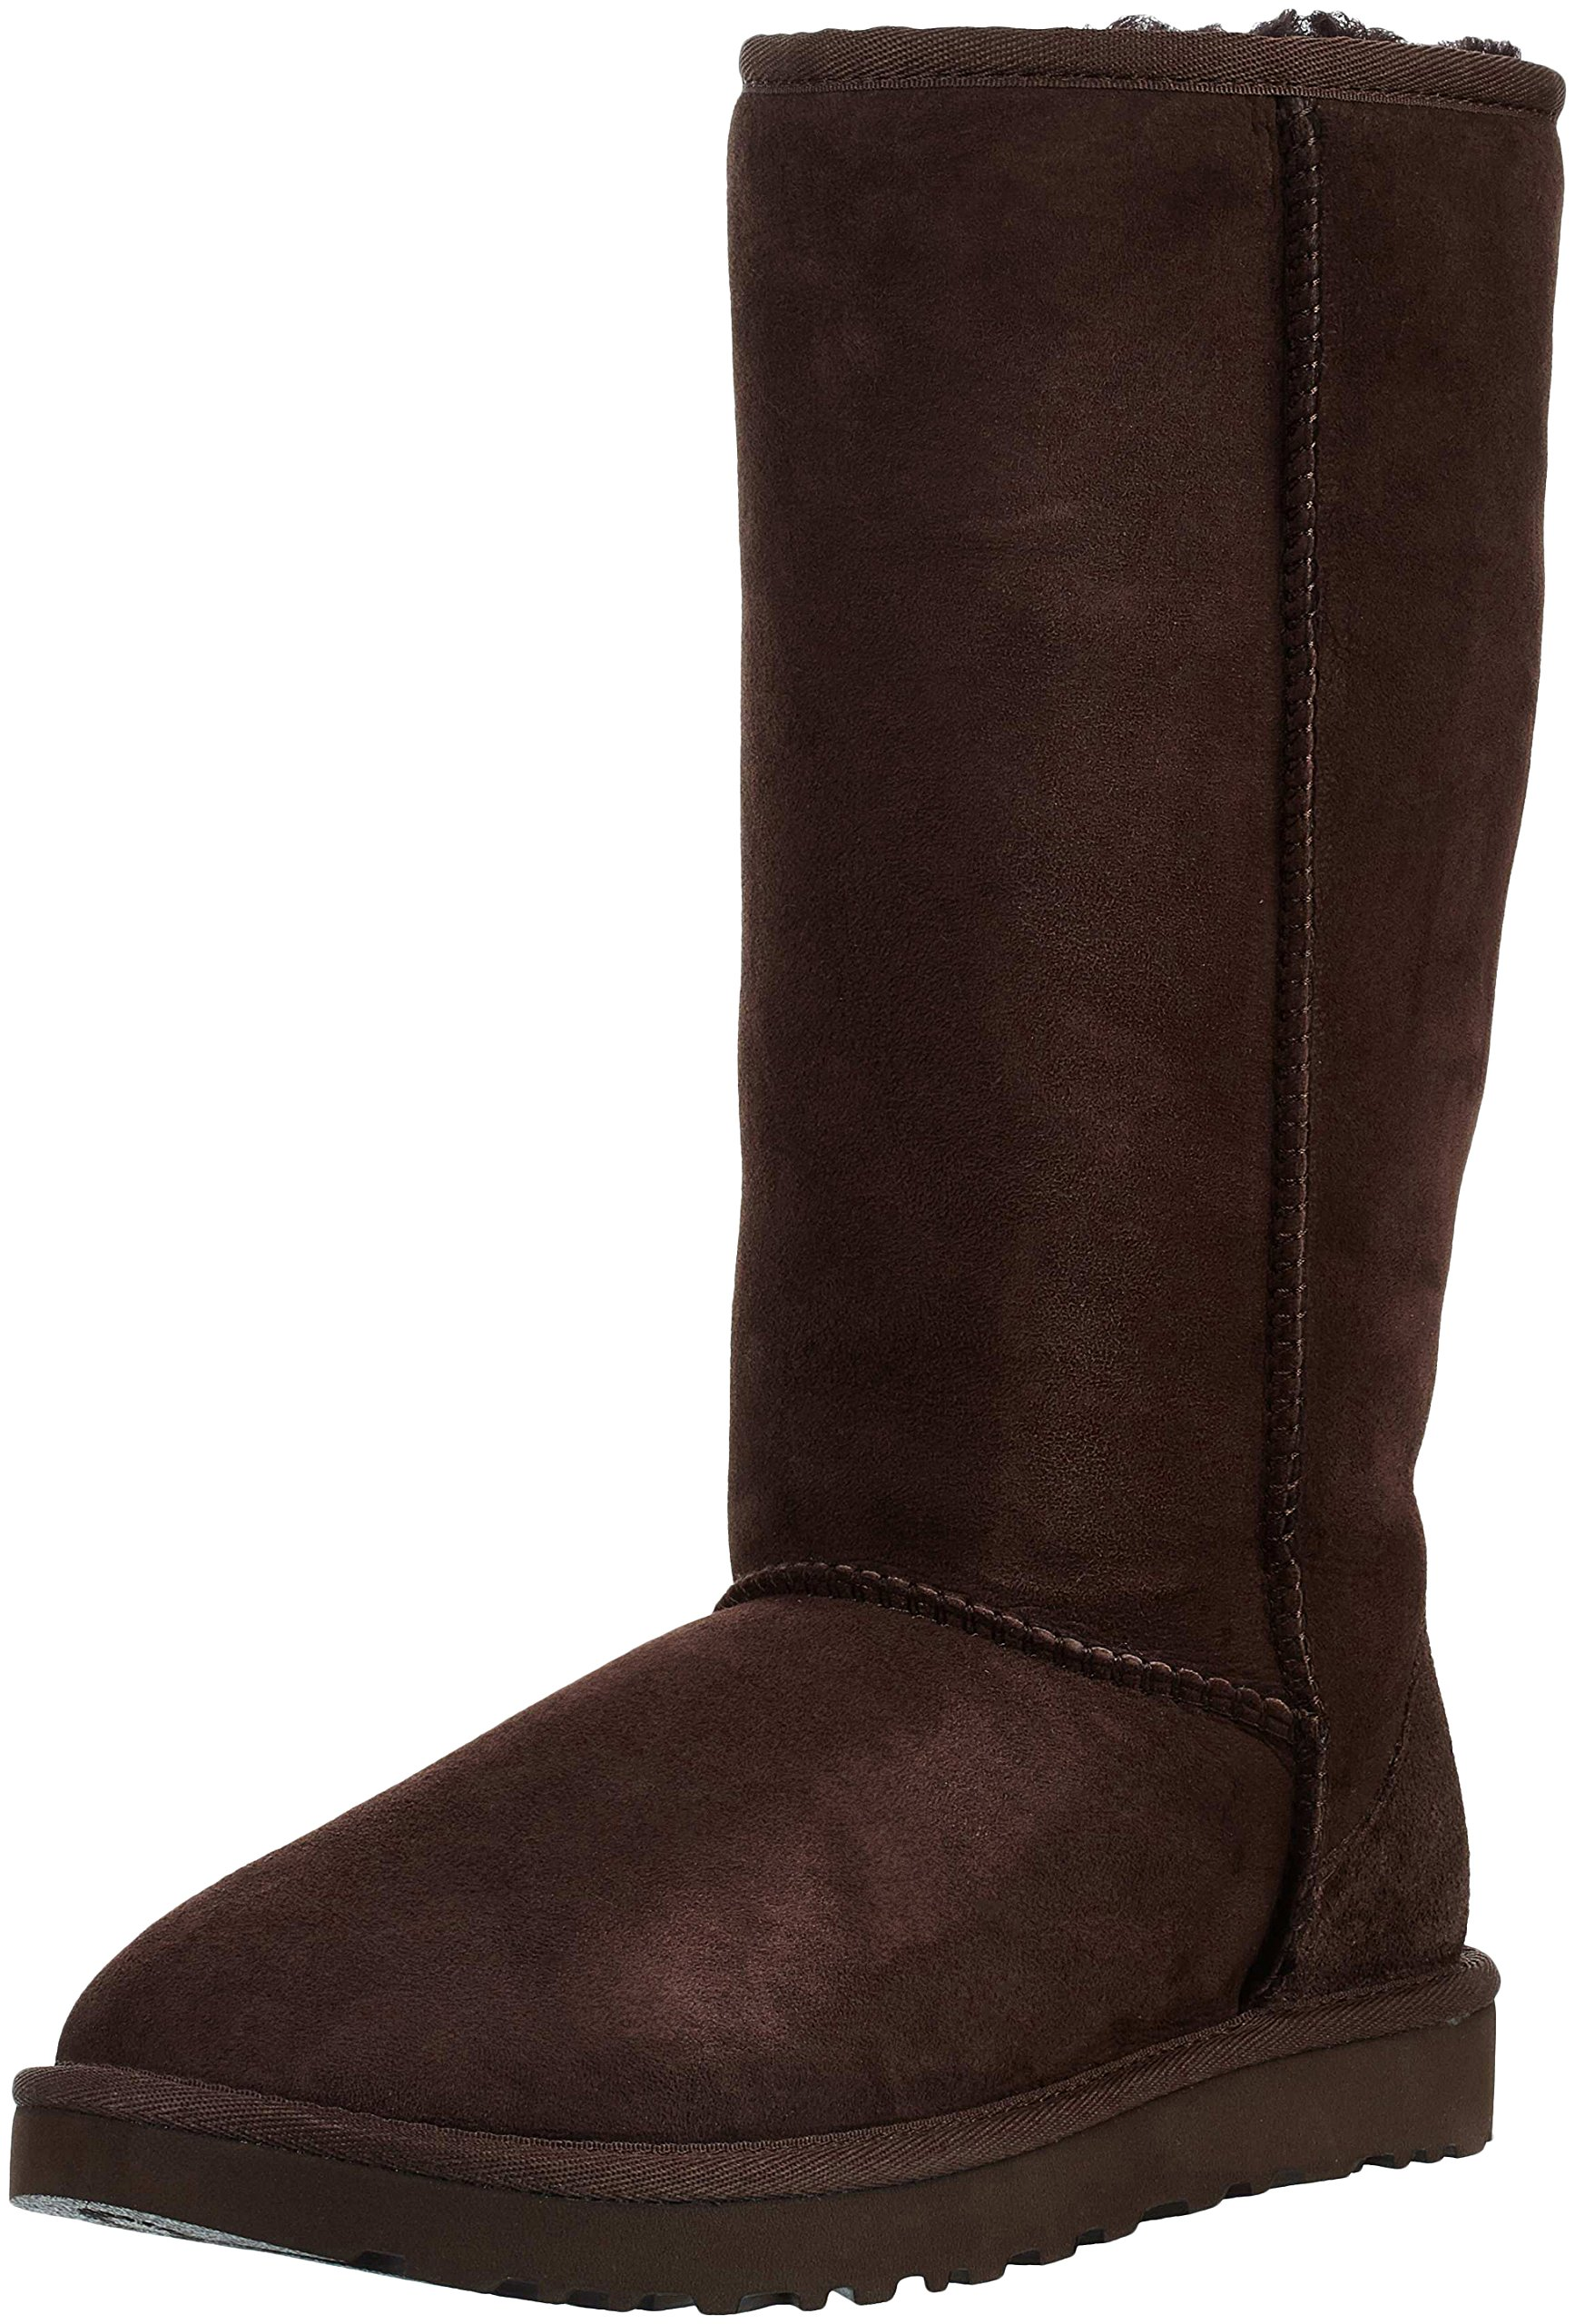 UGG Women's Classic Tall II Winter Boot, Chocolate, 5 B US